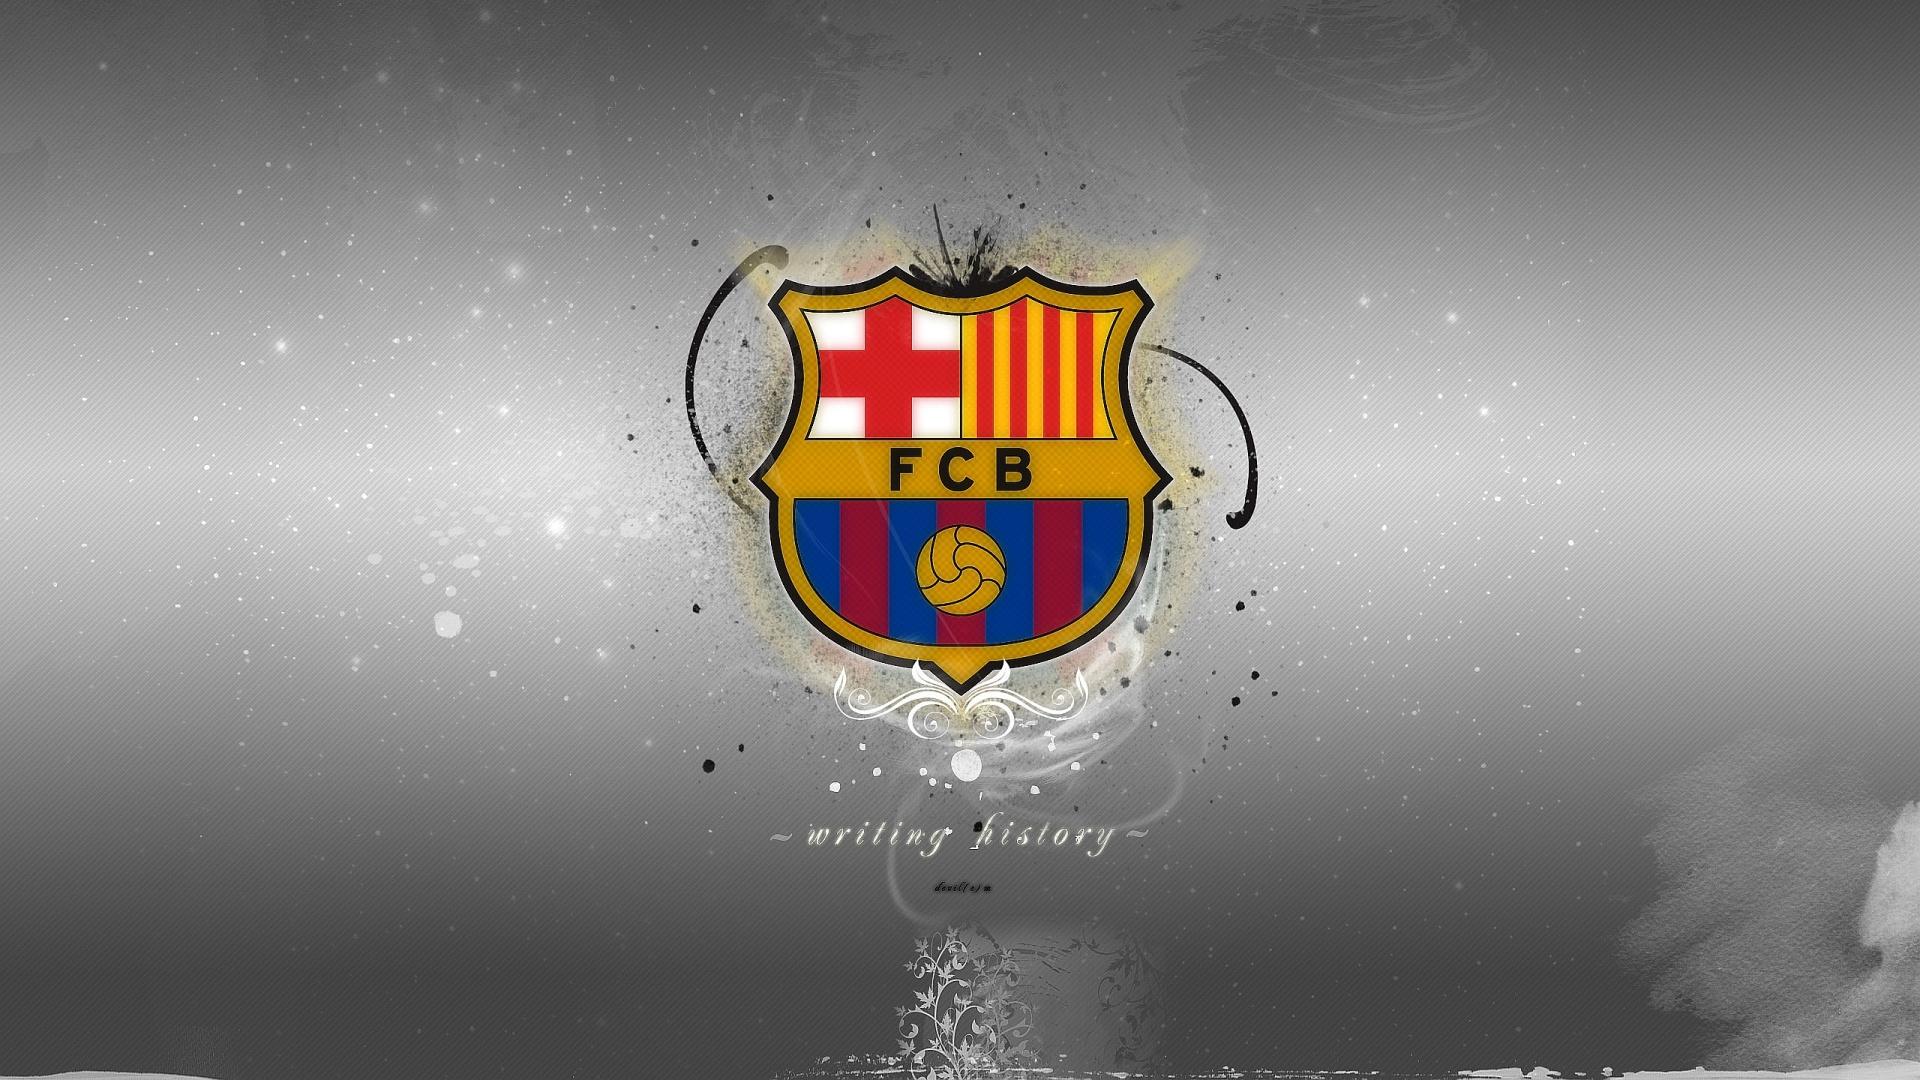 Картинки испанского клуба барселона